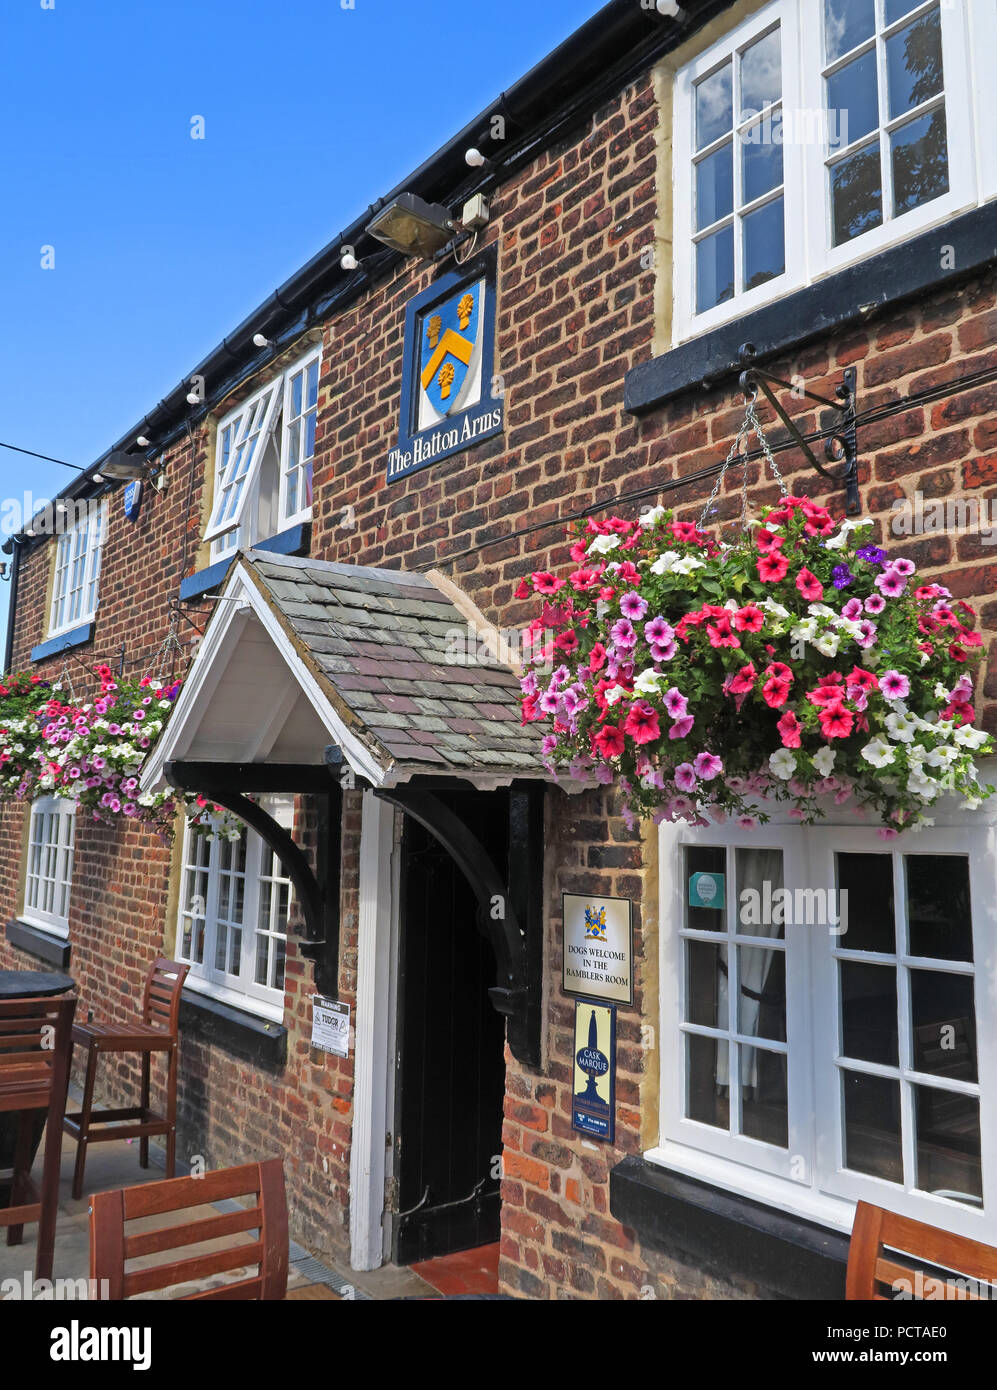 The Hatton Arms grade II listed pub bar, Hatton Village, Near Warrington, Cheshire, North West England, UK Stock Photo